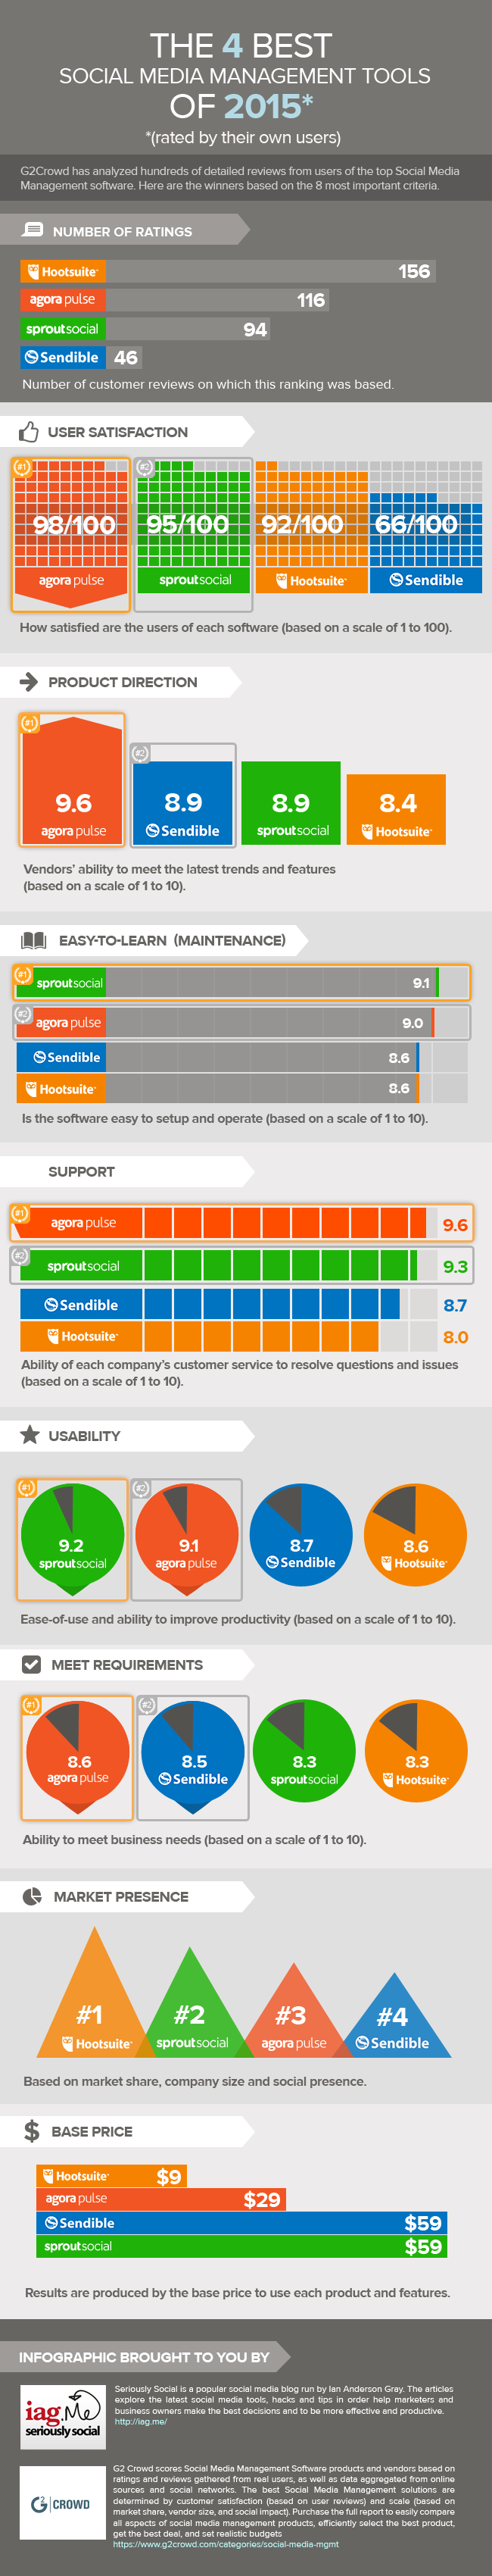 infographic-social-media-tools.png